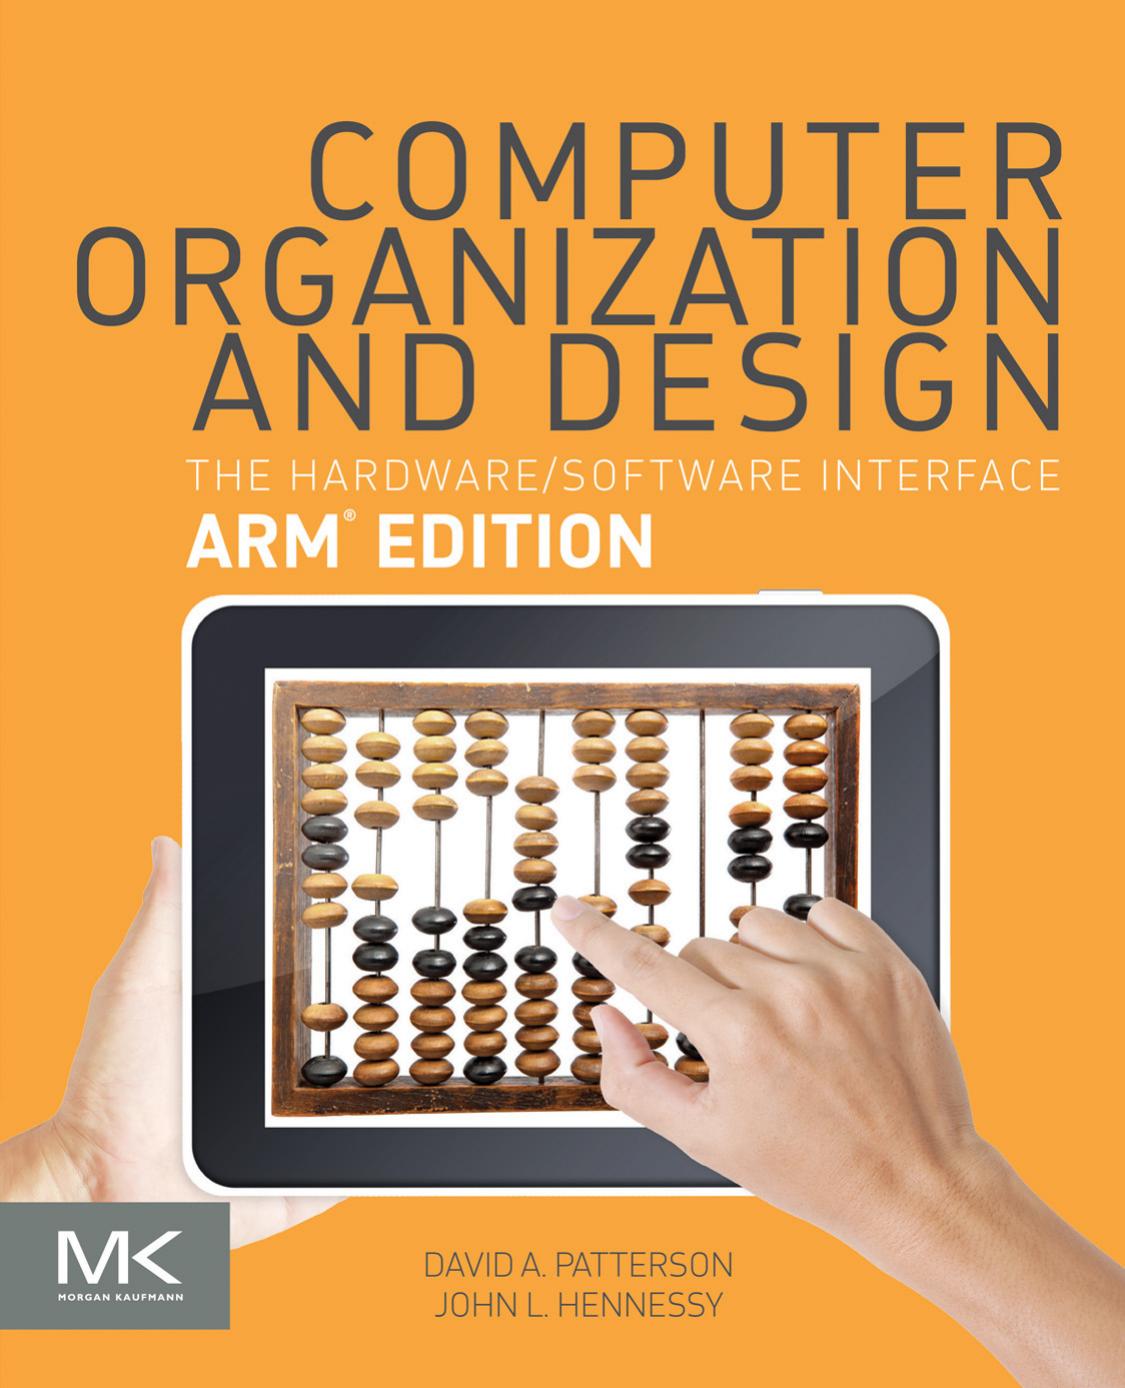 Computer Organization and Design The hardwaresoftware interface